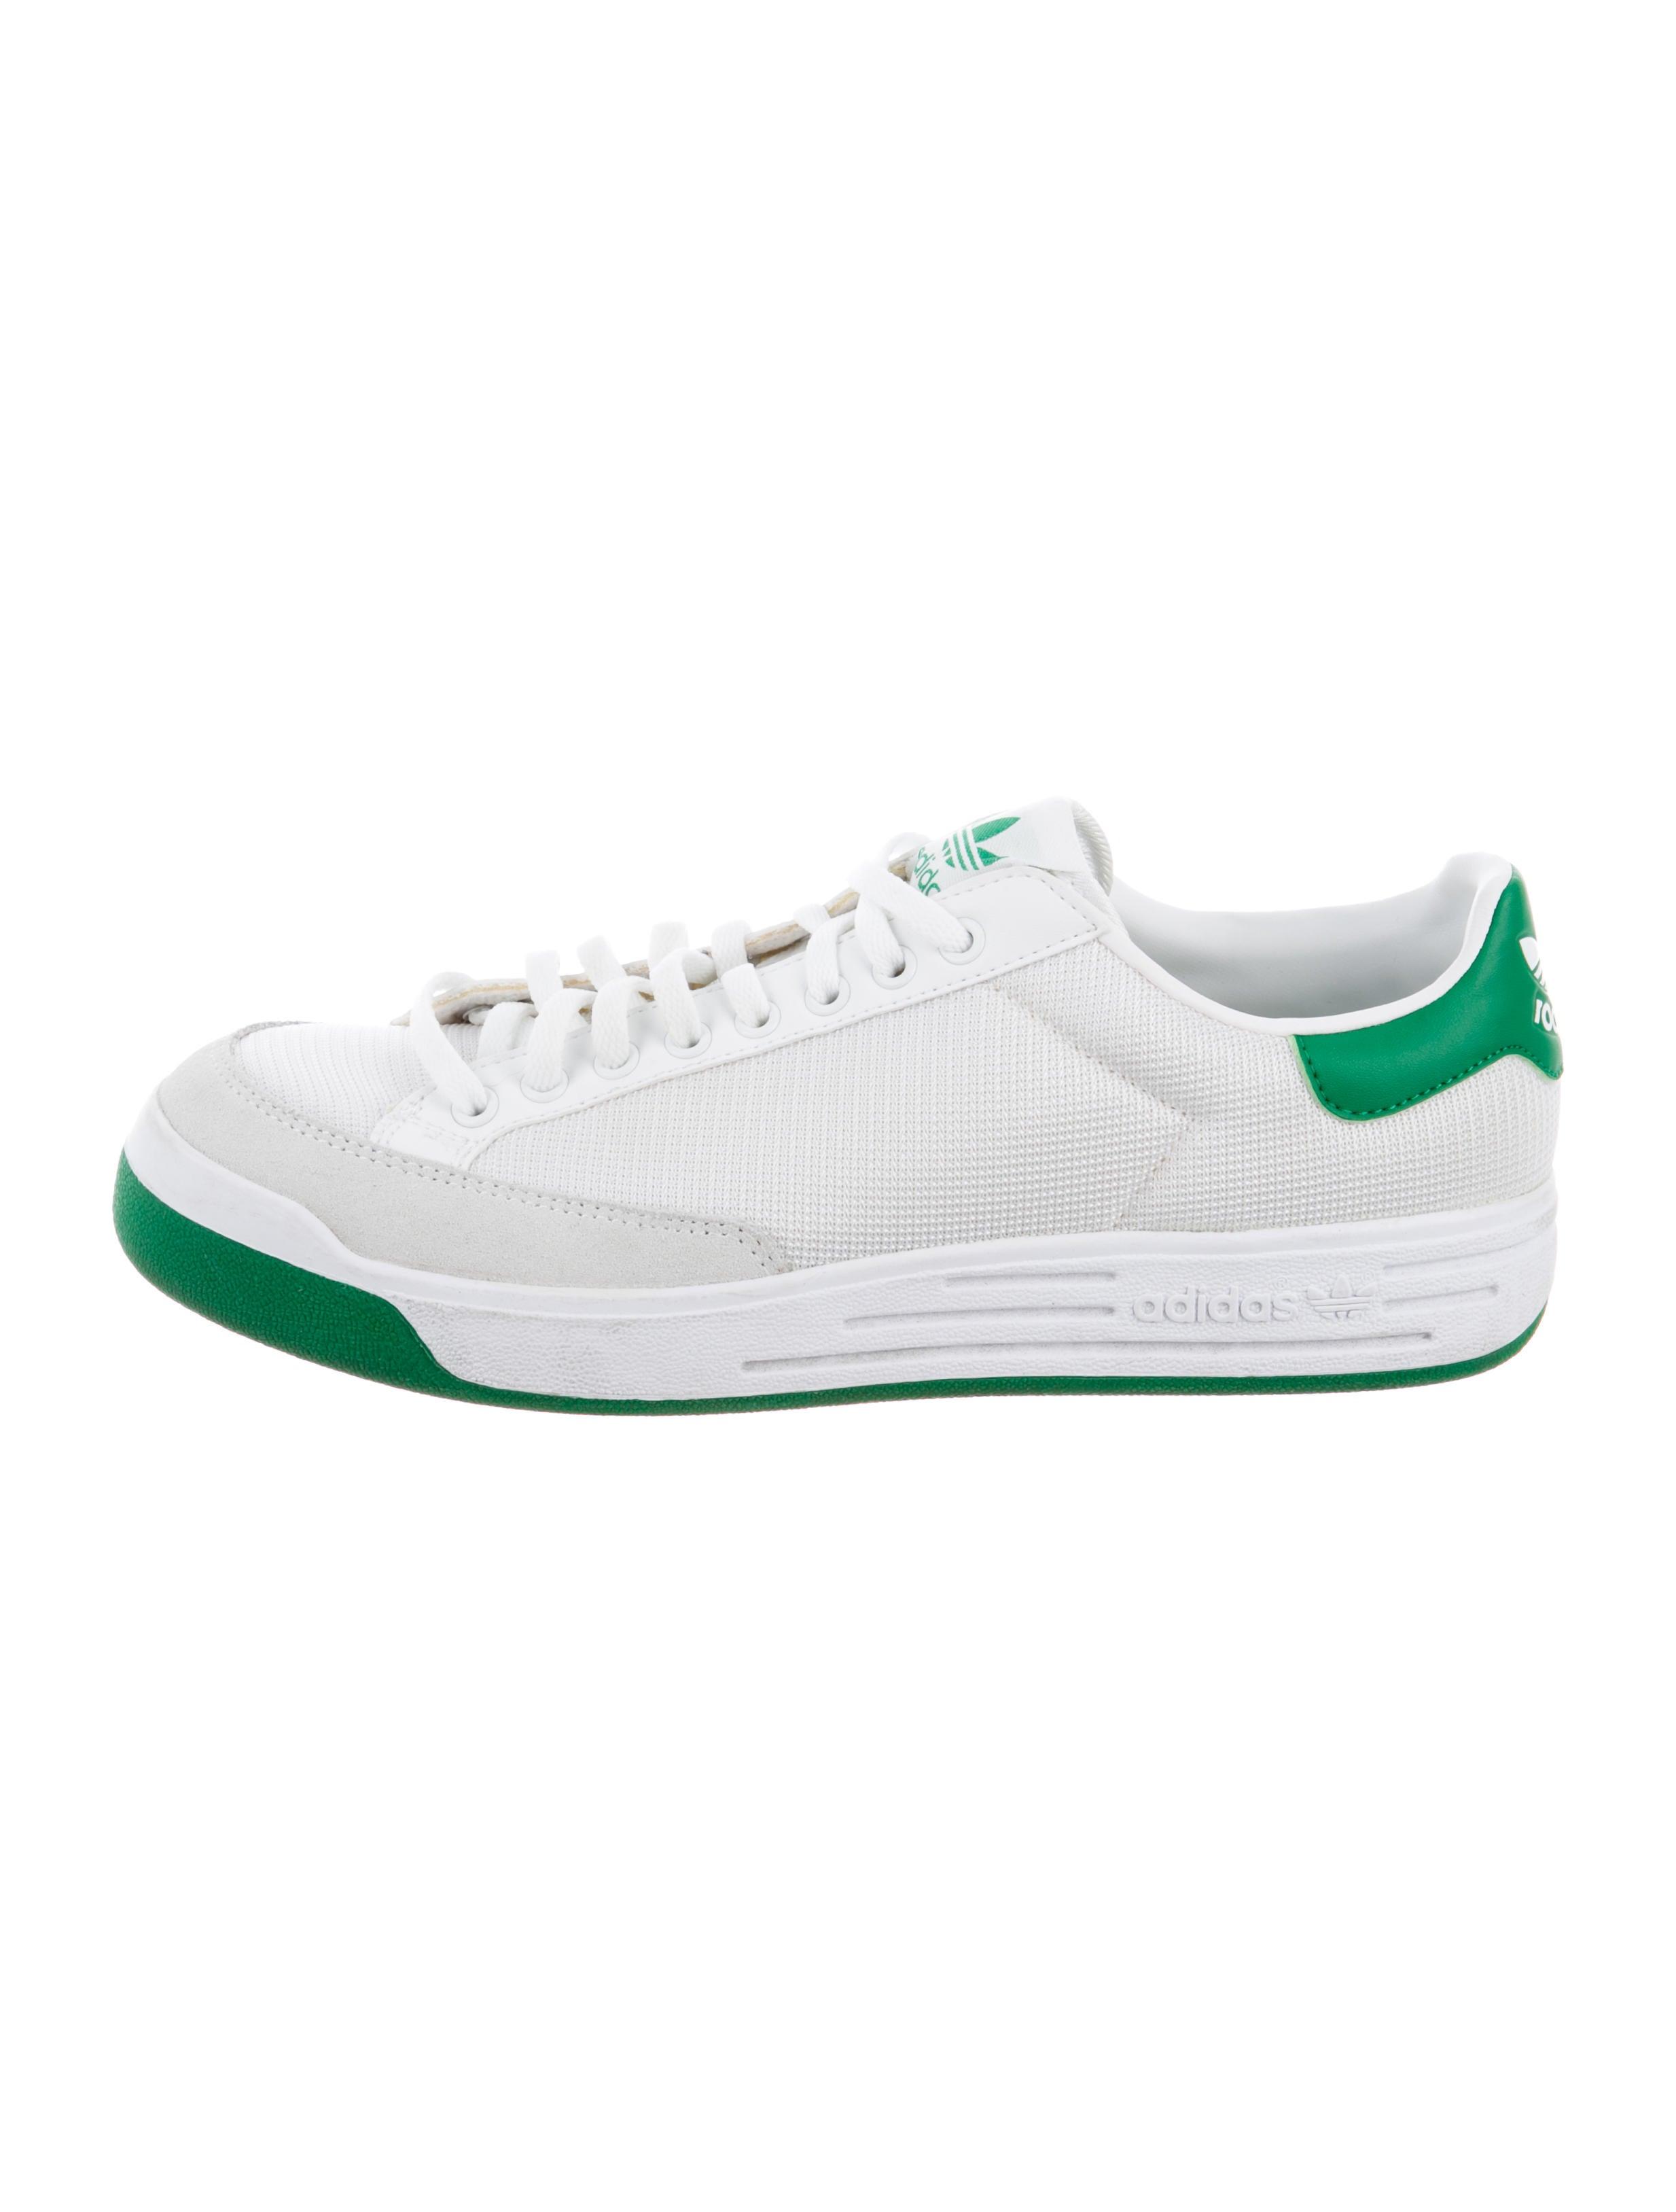 Adidas Rod Alghe Basso Top Scarpe Scarpe W2ads21907 La Realreal